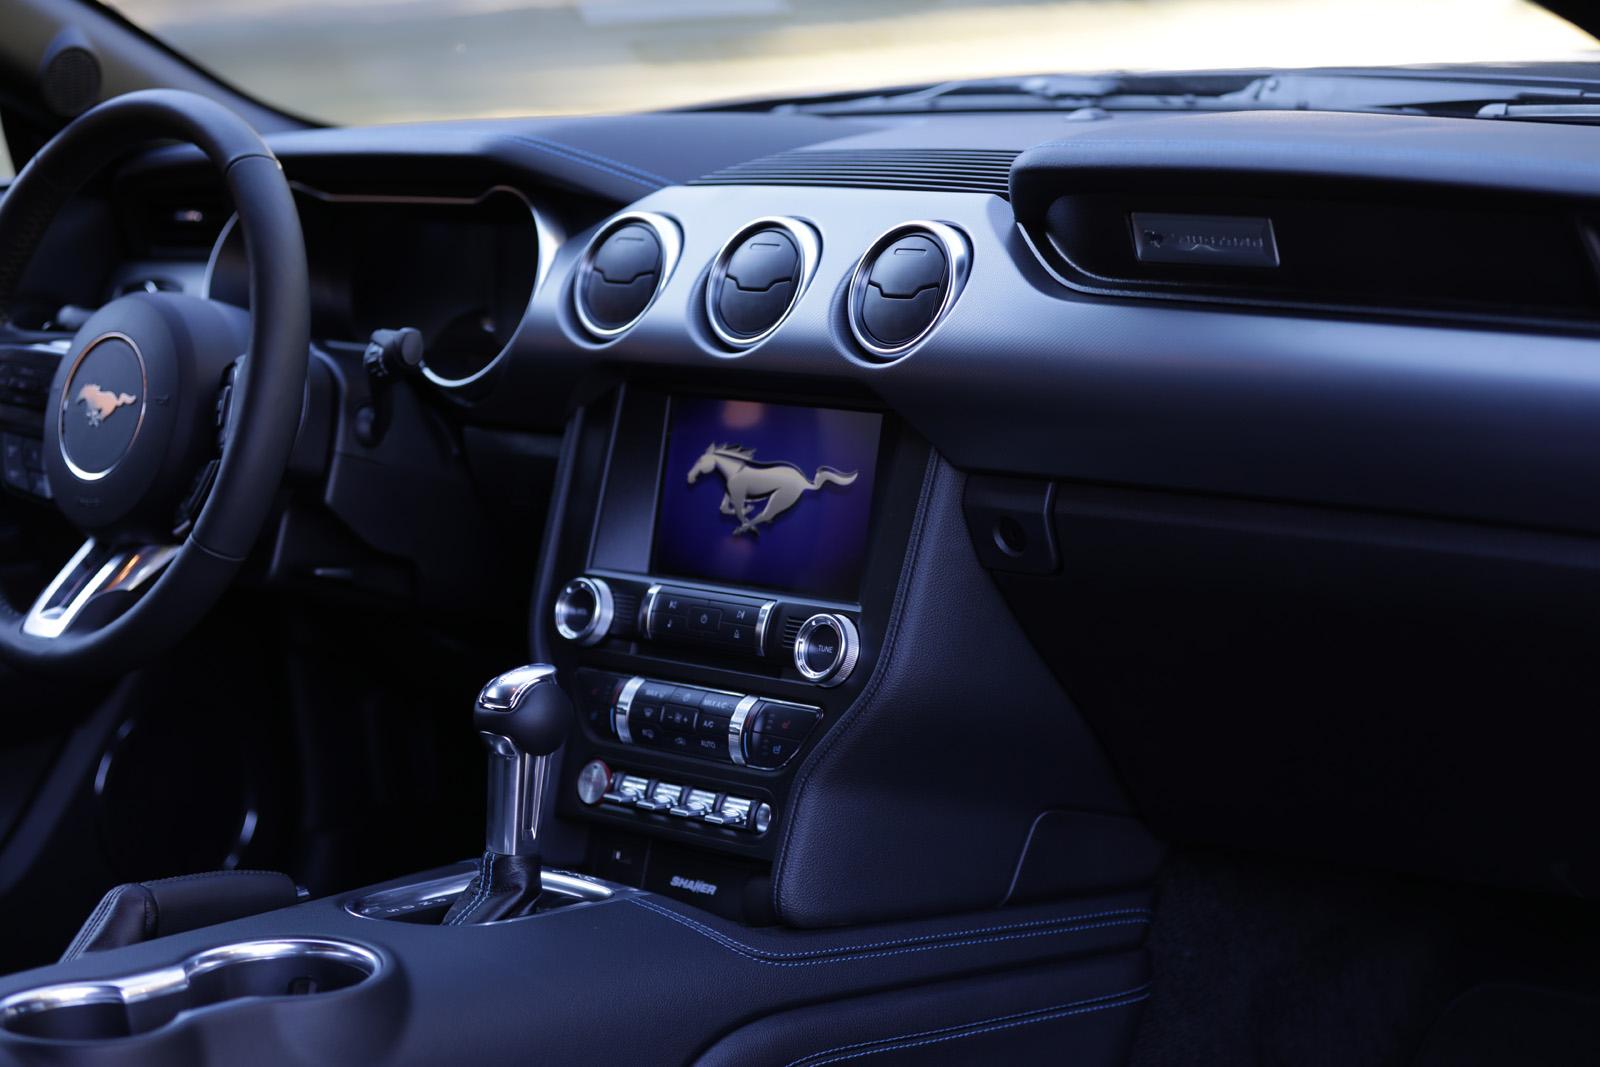 2018 Ford Mustang Interior Next